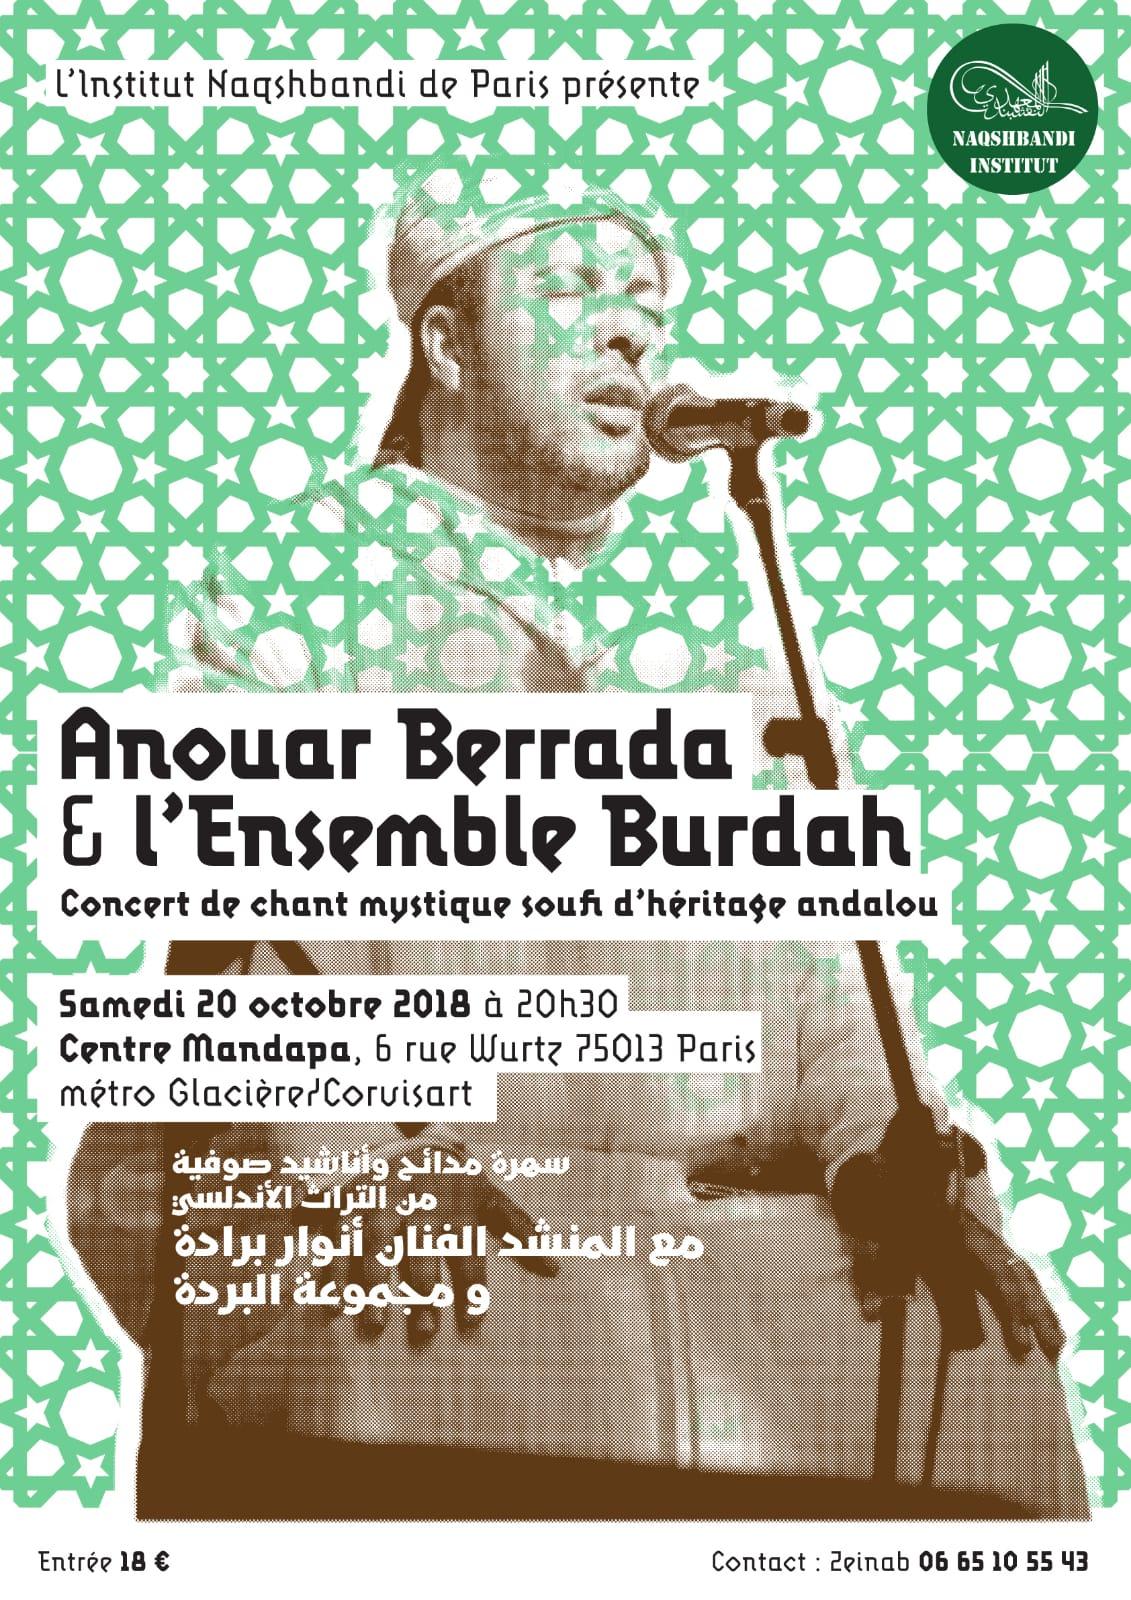 https://www.saphirnews.com/agenda/Anouar-Barrada-l-ensemble-Burdah_ae608301.html